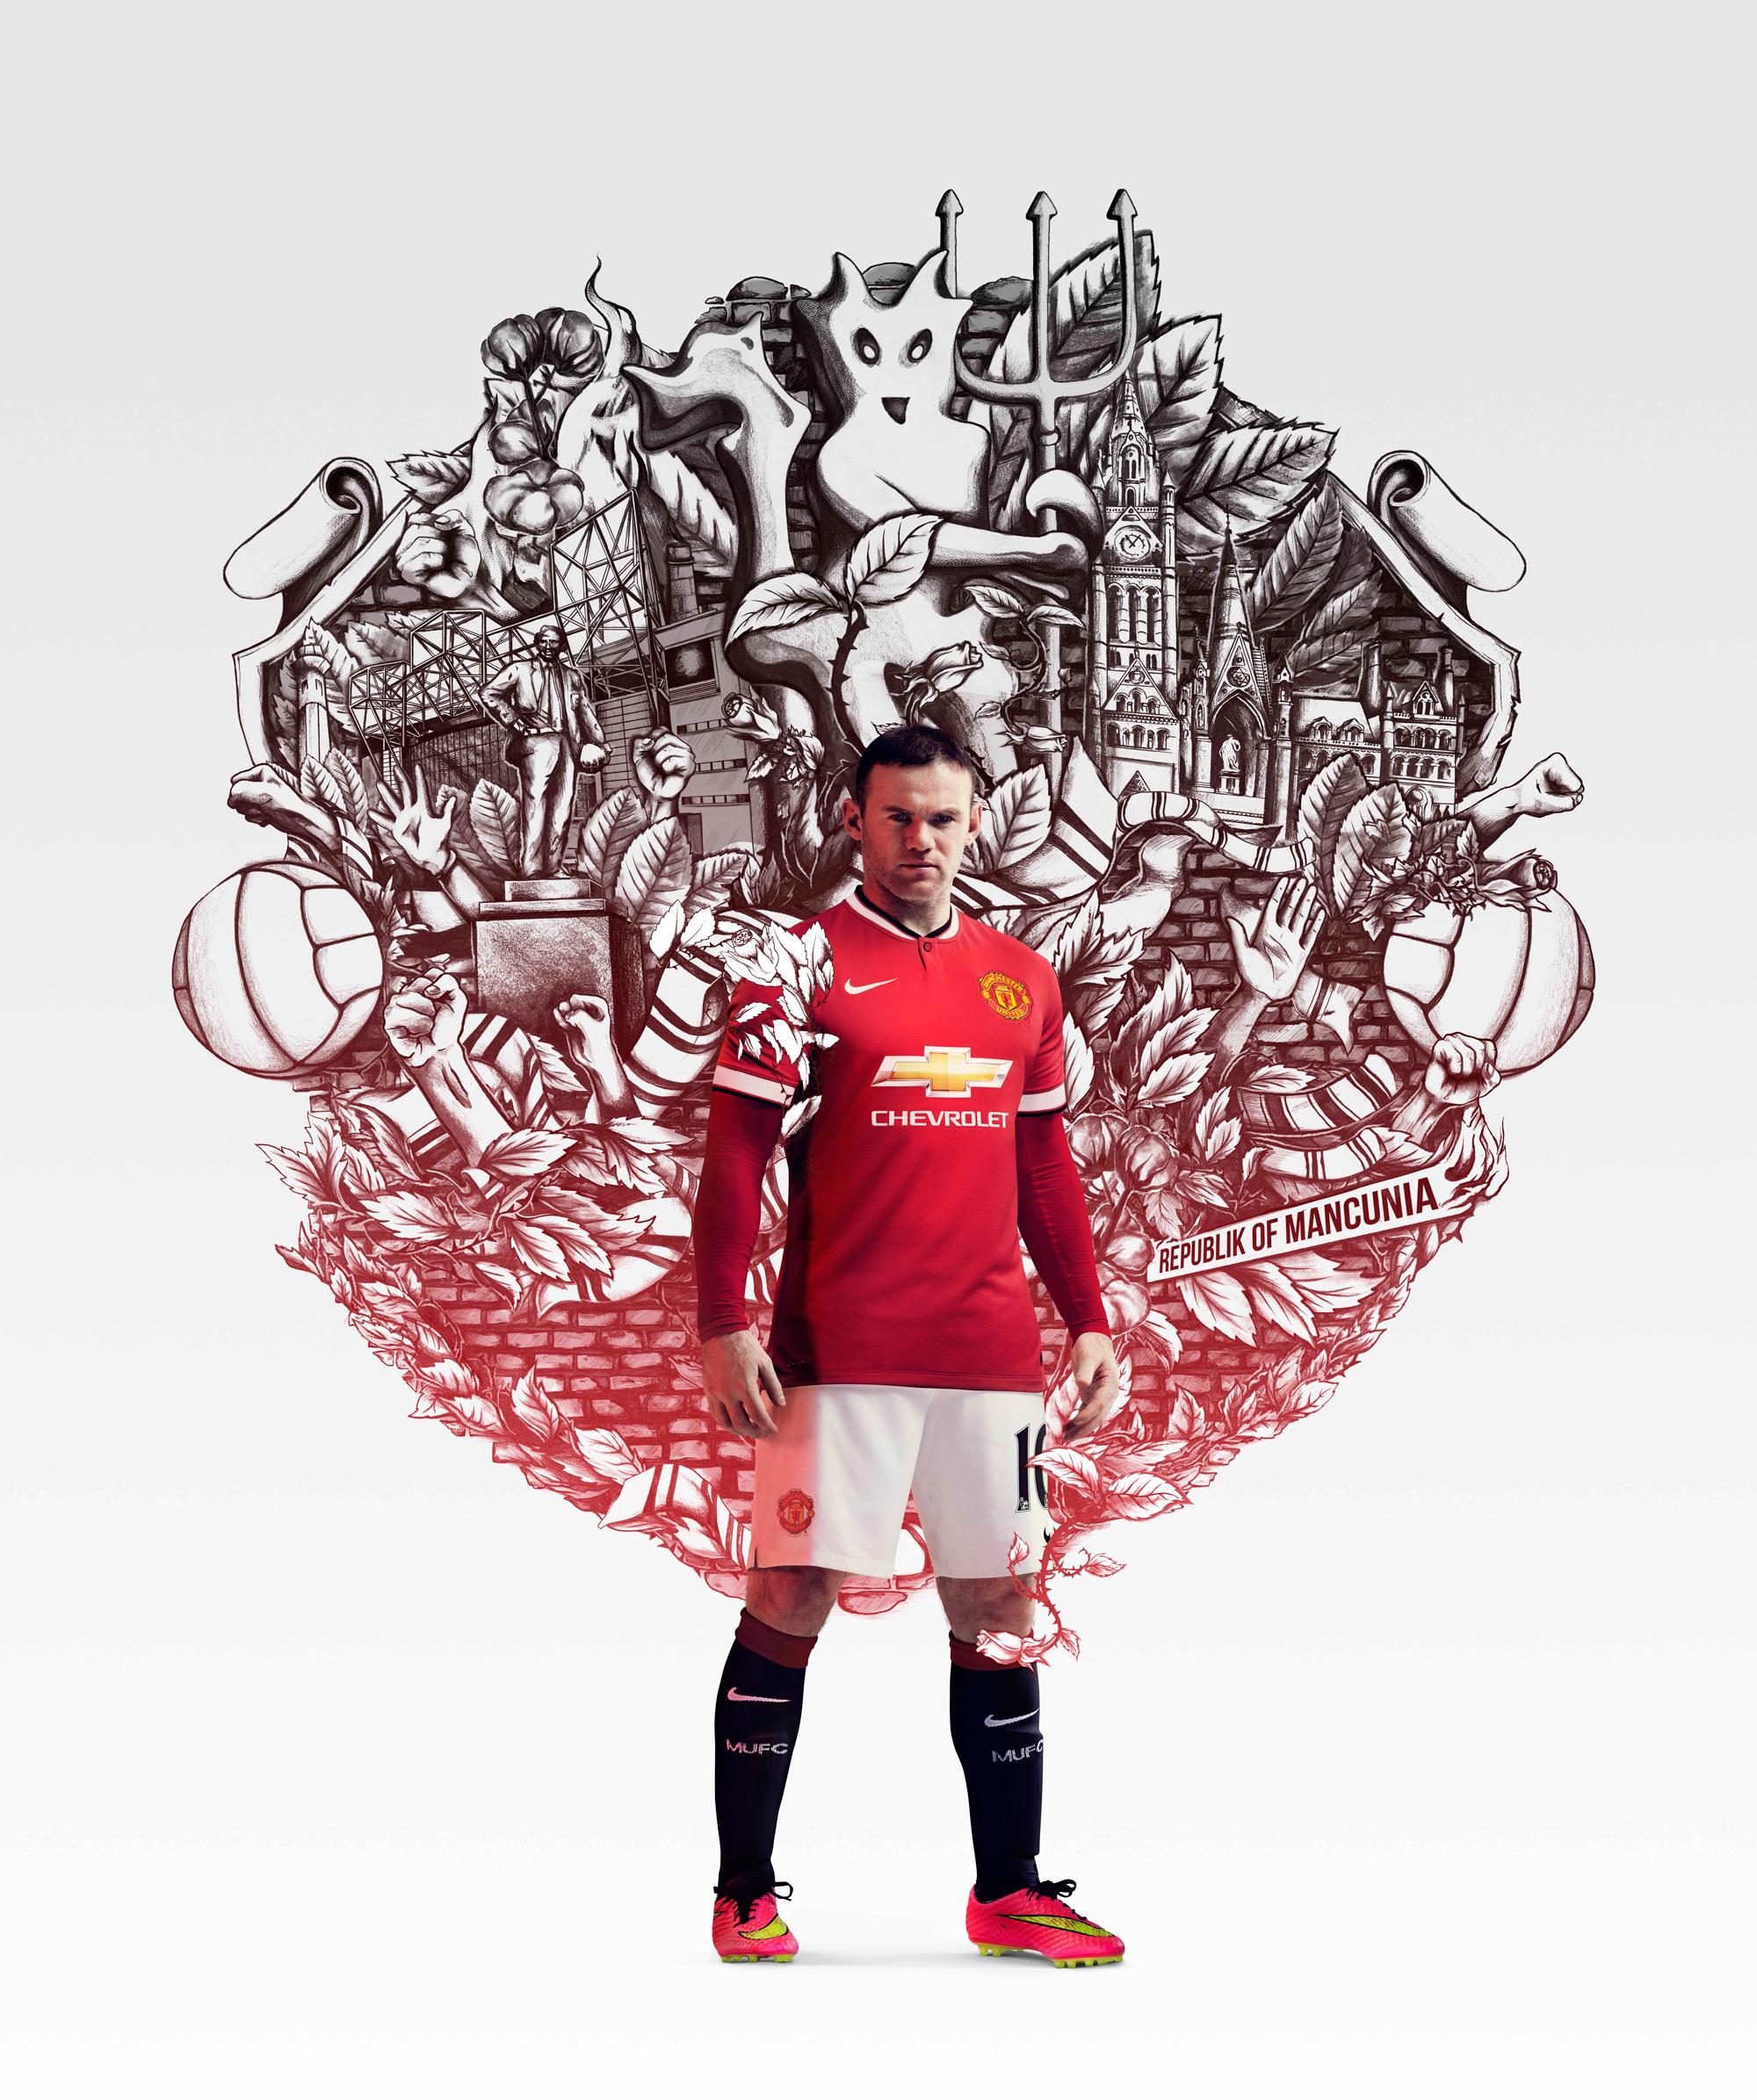 Su14_FB_Club_MUFC_Rooney_Hero_002_31080_2000pix